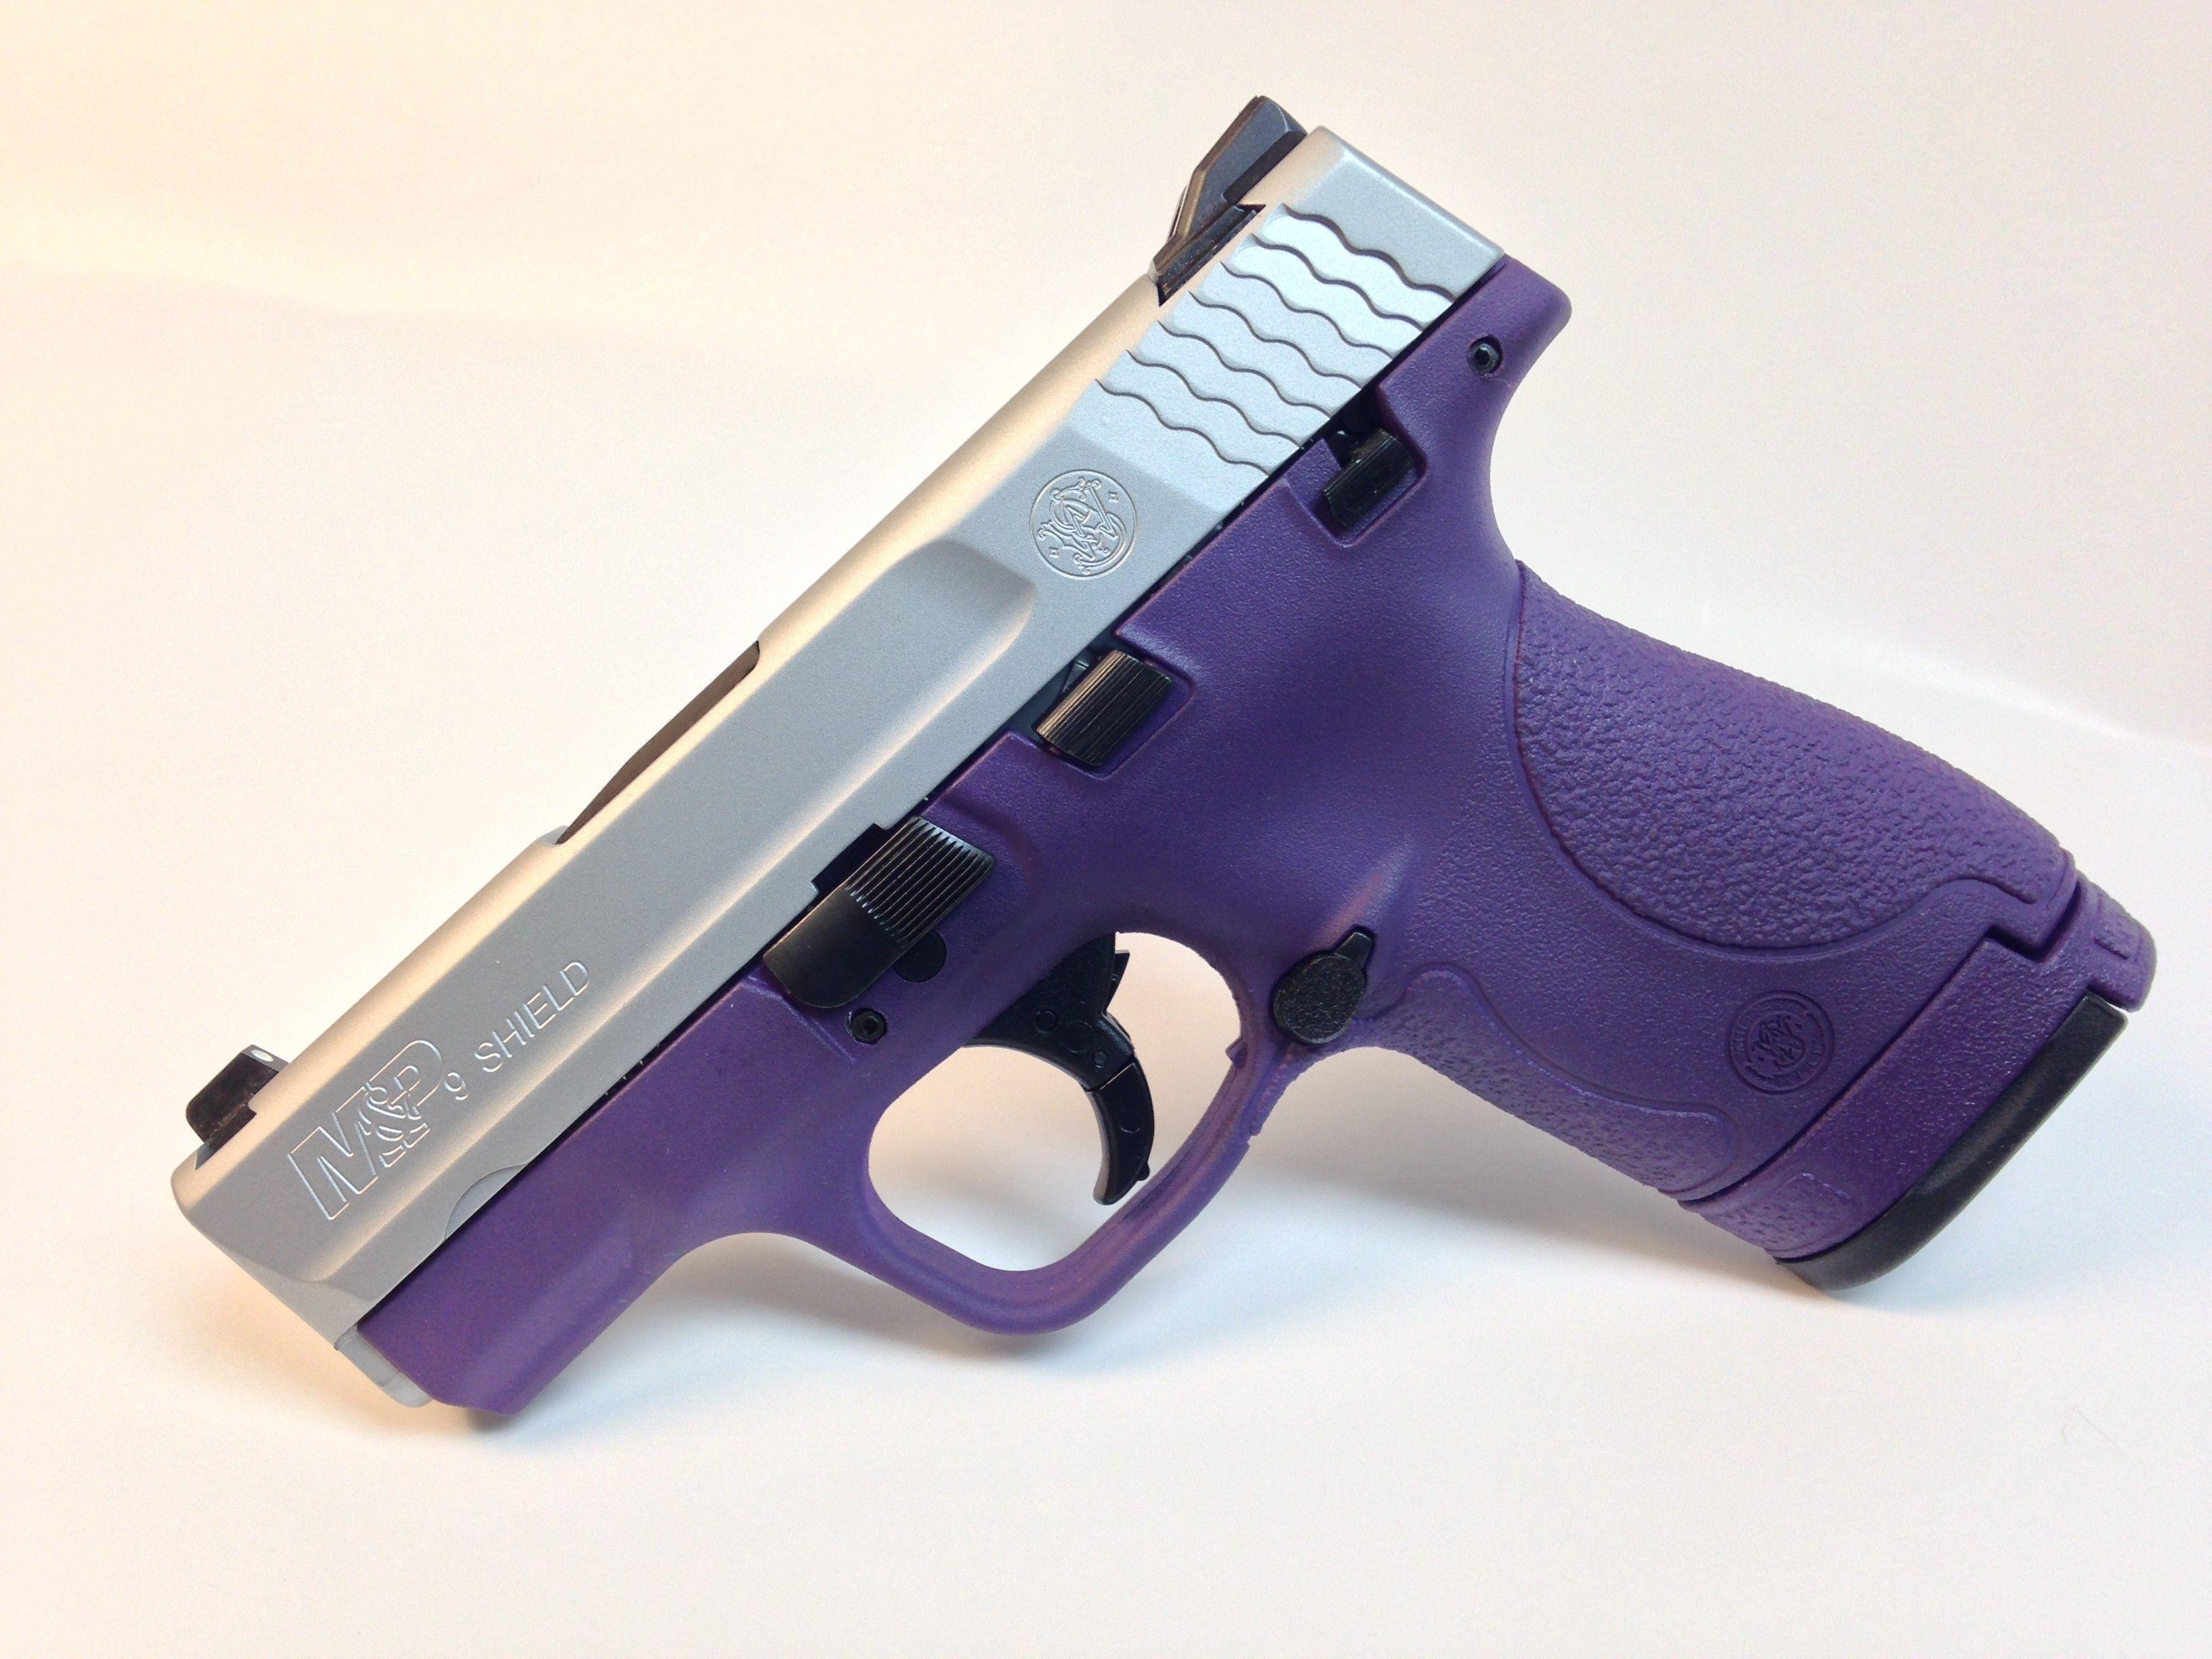 Goddess Purple S&W Shield 9mm | Gun shop | M&p shield 9mm, Guns, M&p